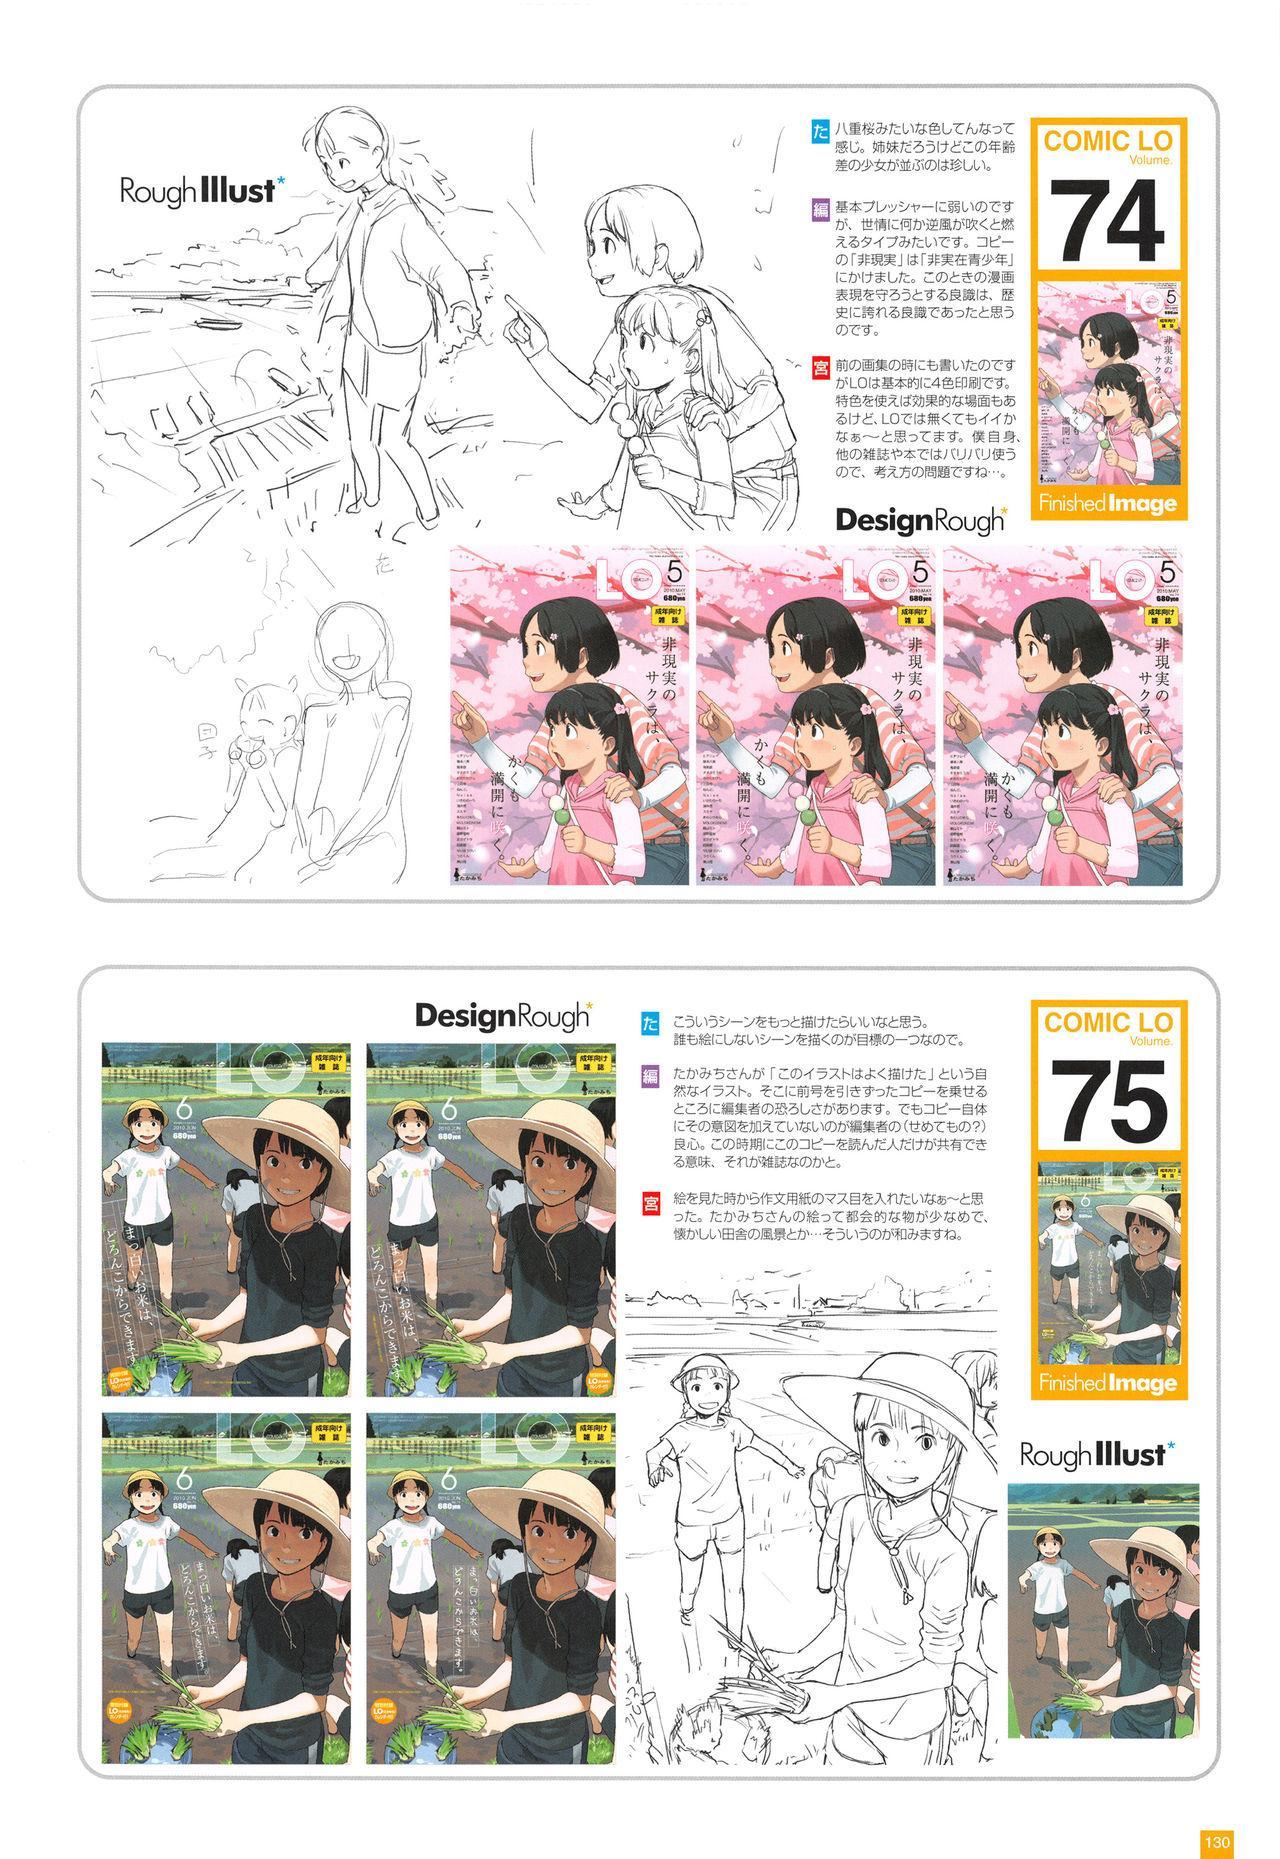 LO Artbook 2-A TAKAMICHI LOOP WORKS 132